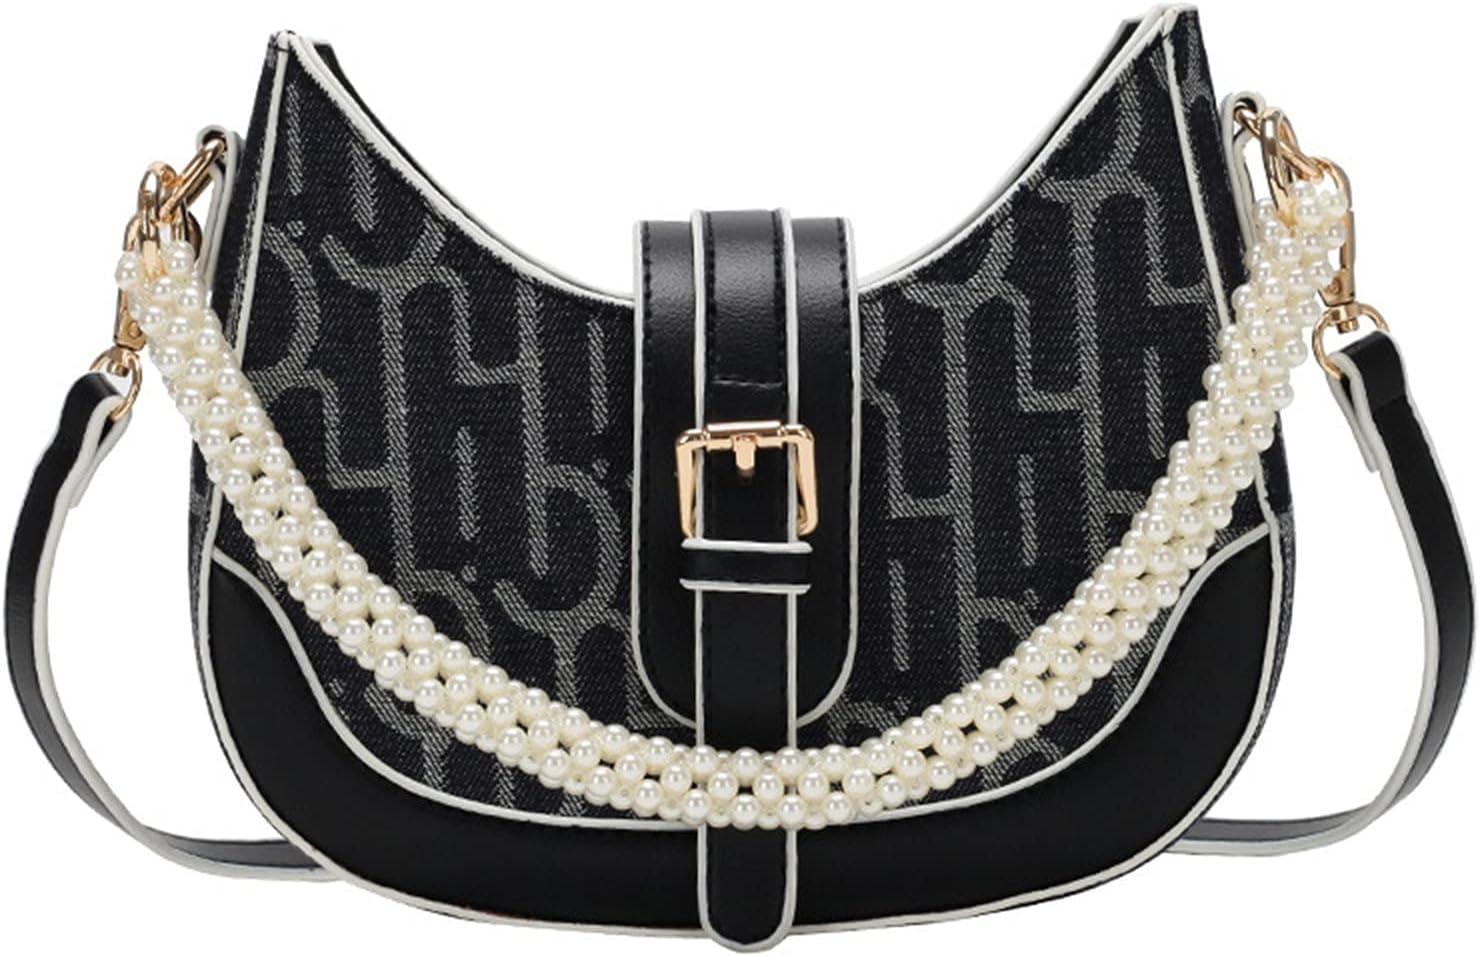 HJYHJ Low price Crossbody Bag for Stylish Max 84% OFF Purses Women Designer